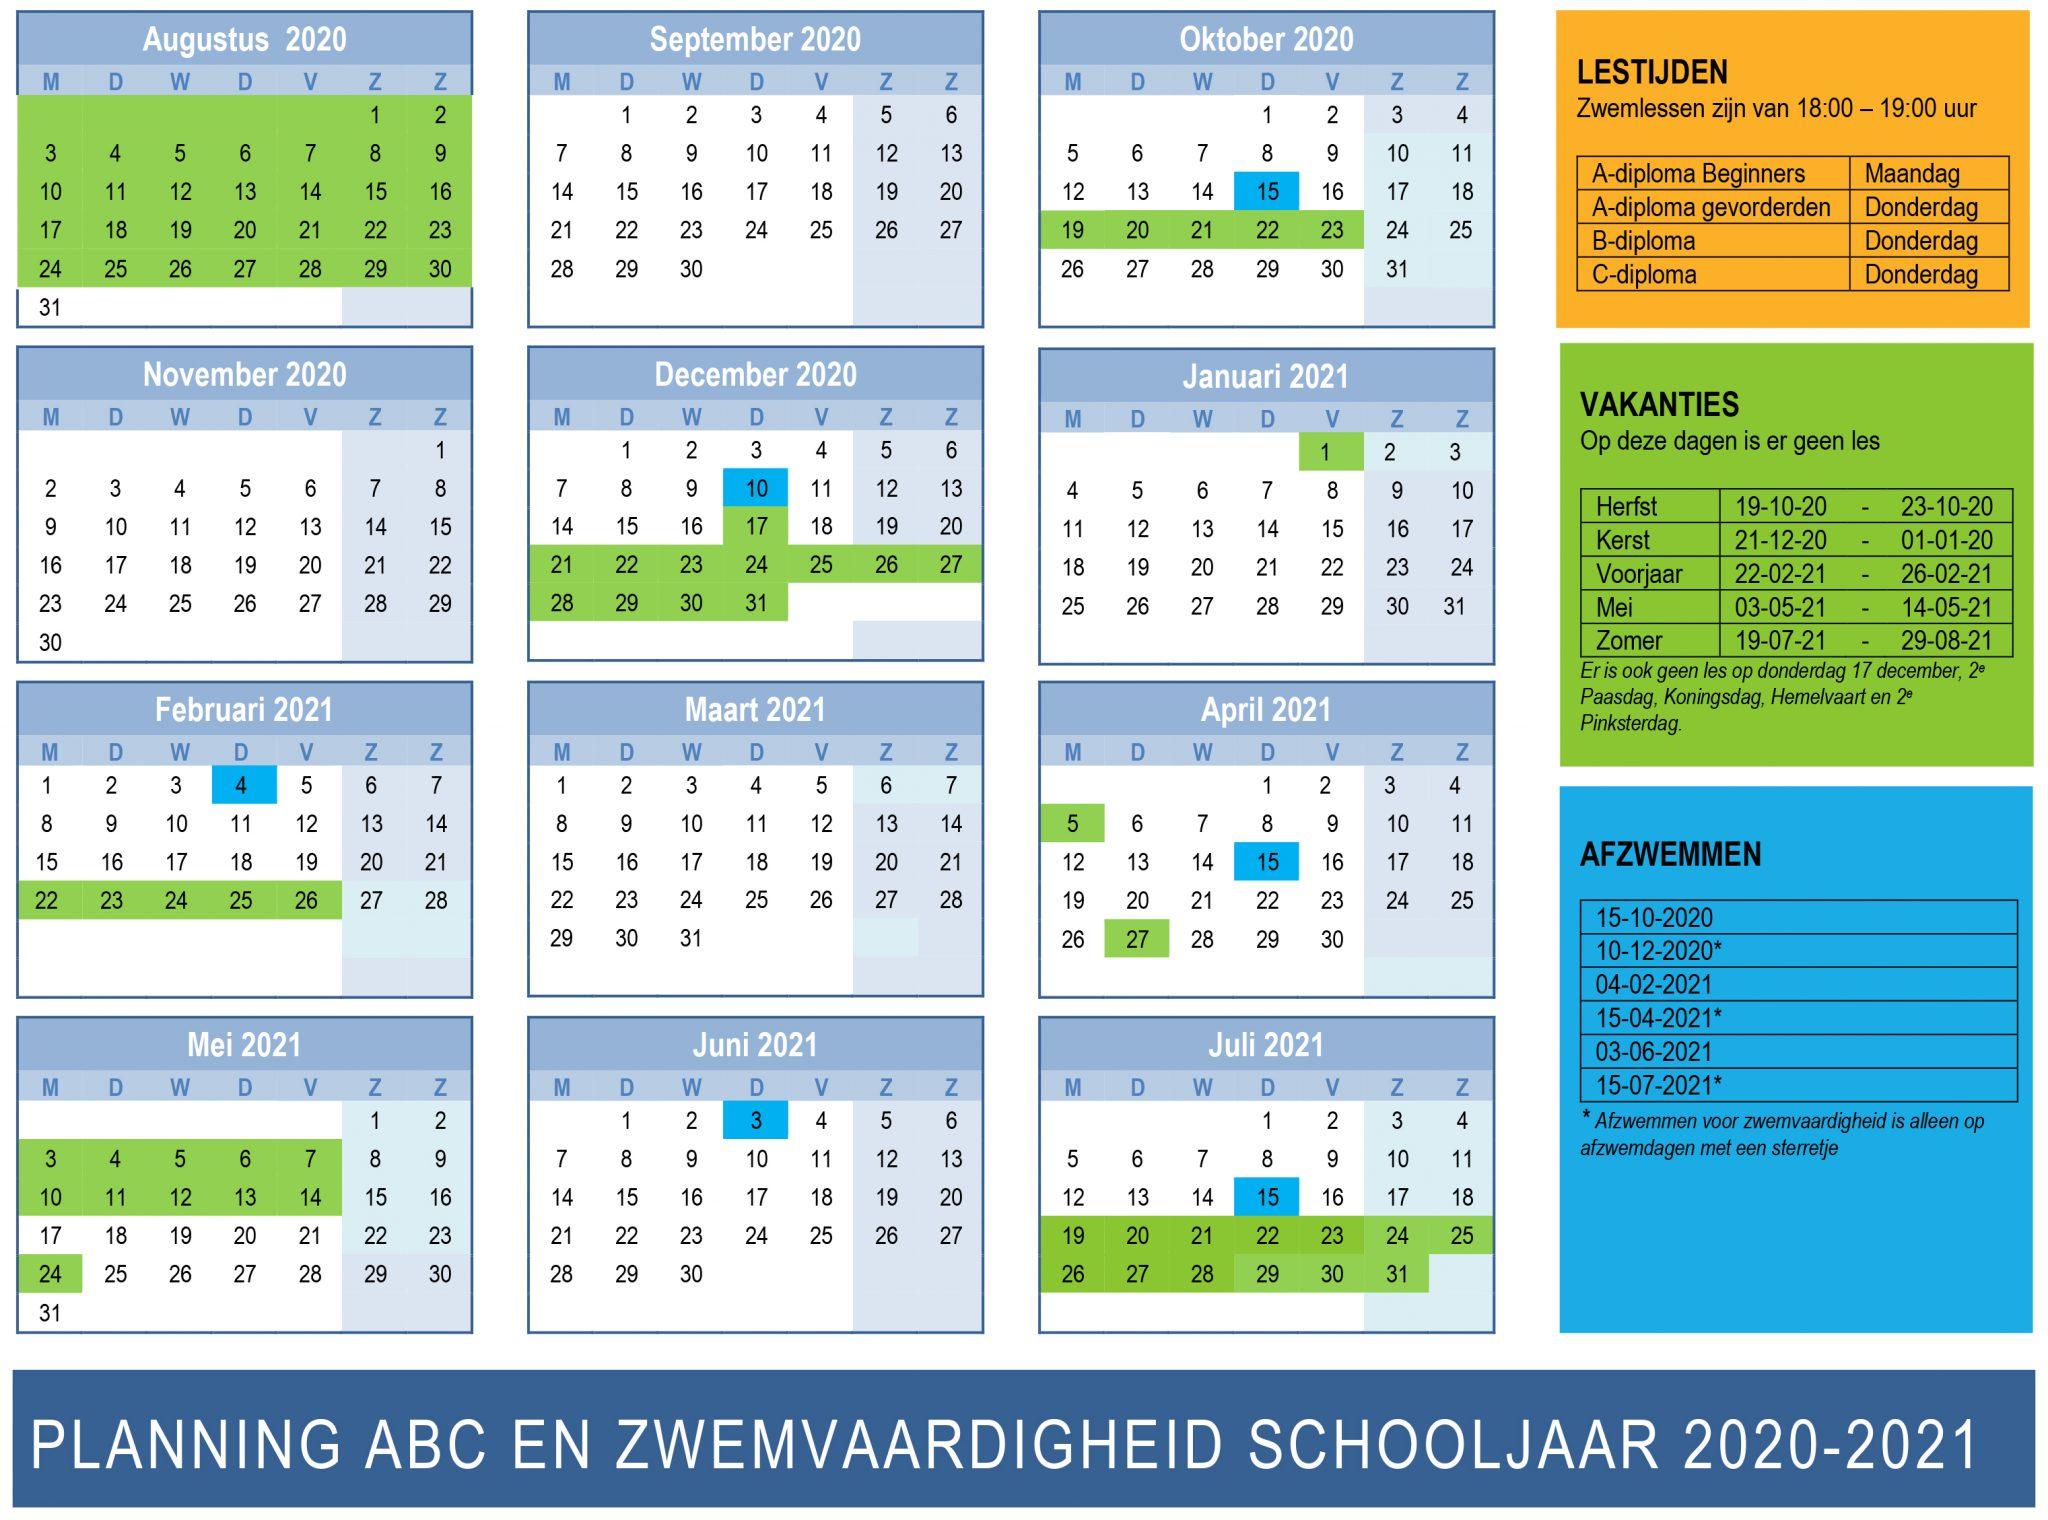 Planning ABC zwemmen en zwemvaardigheid 2020-2021 Zwemclub Zeist